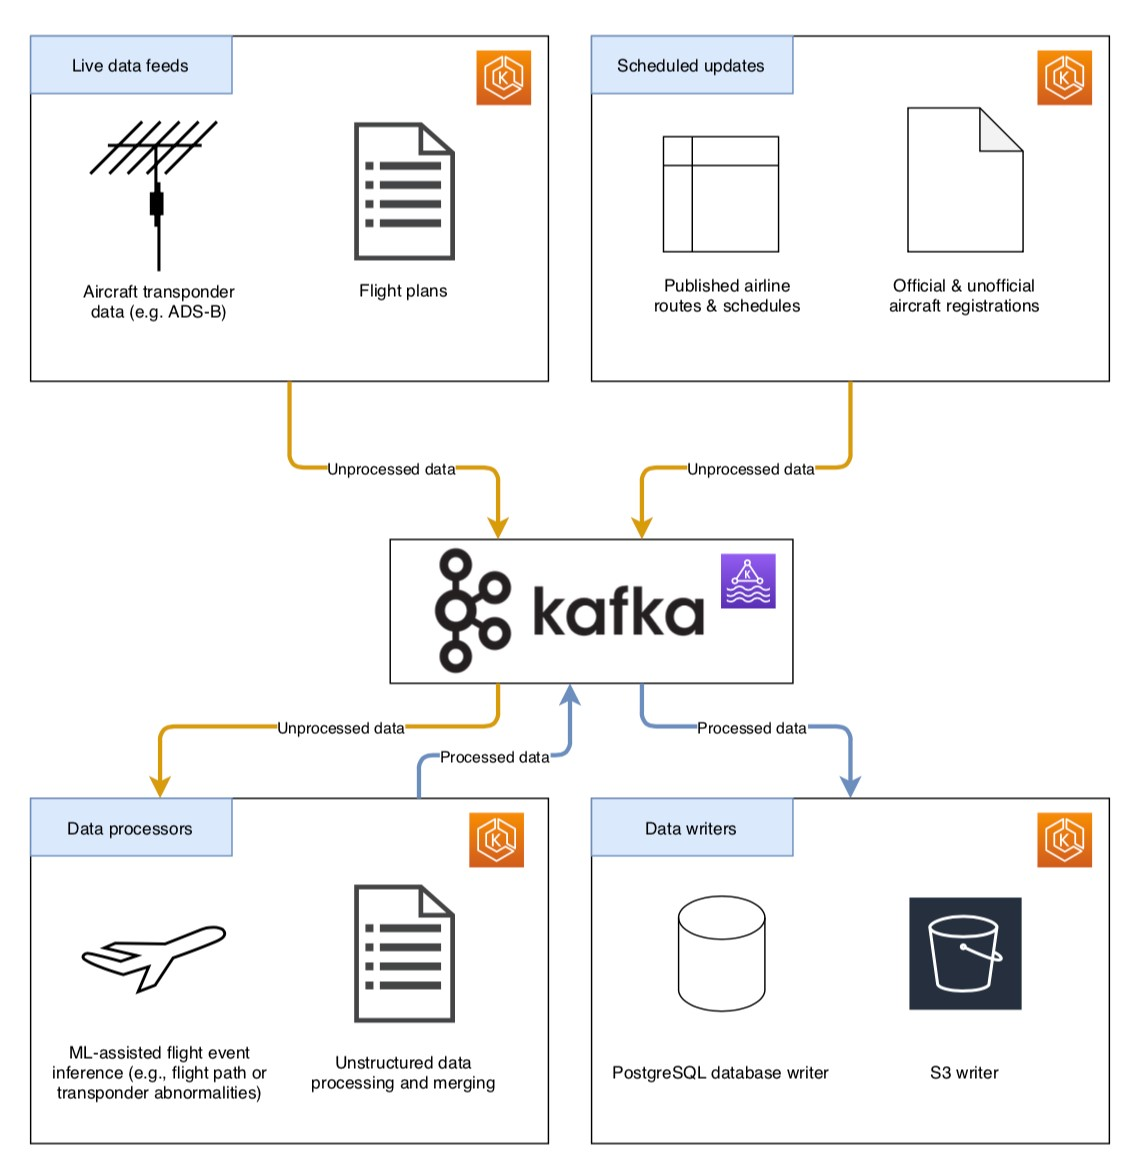 Figure 1: Icarus flights data processing architecture